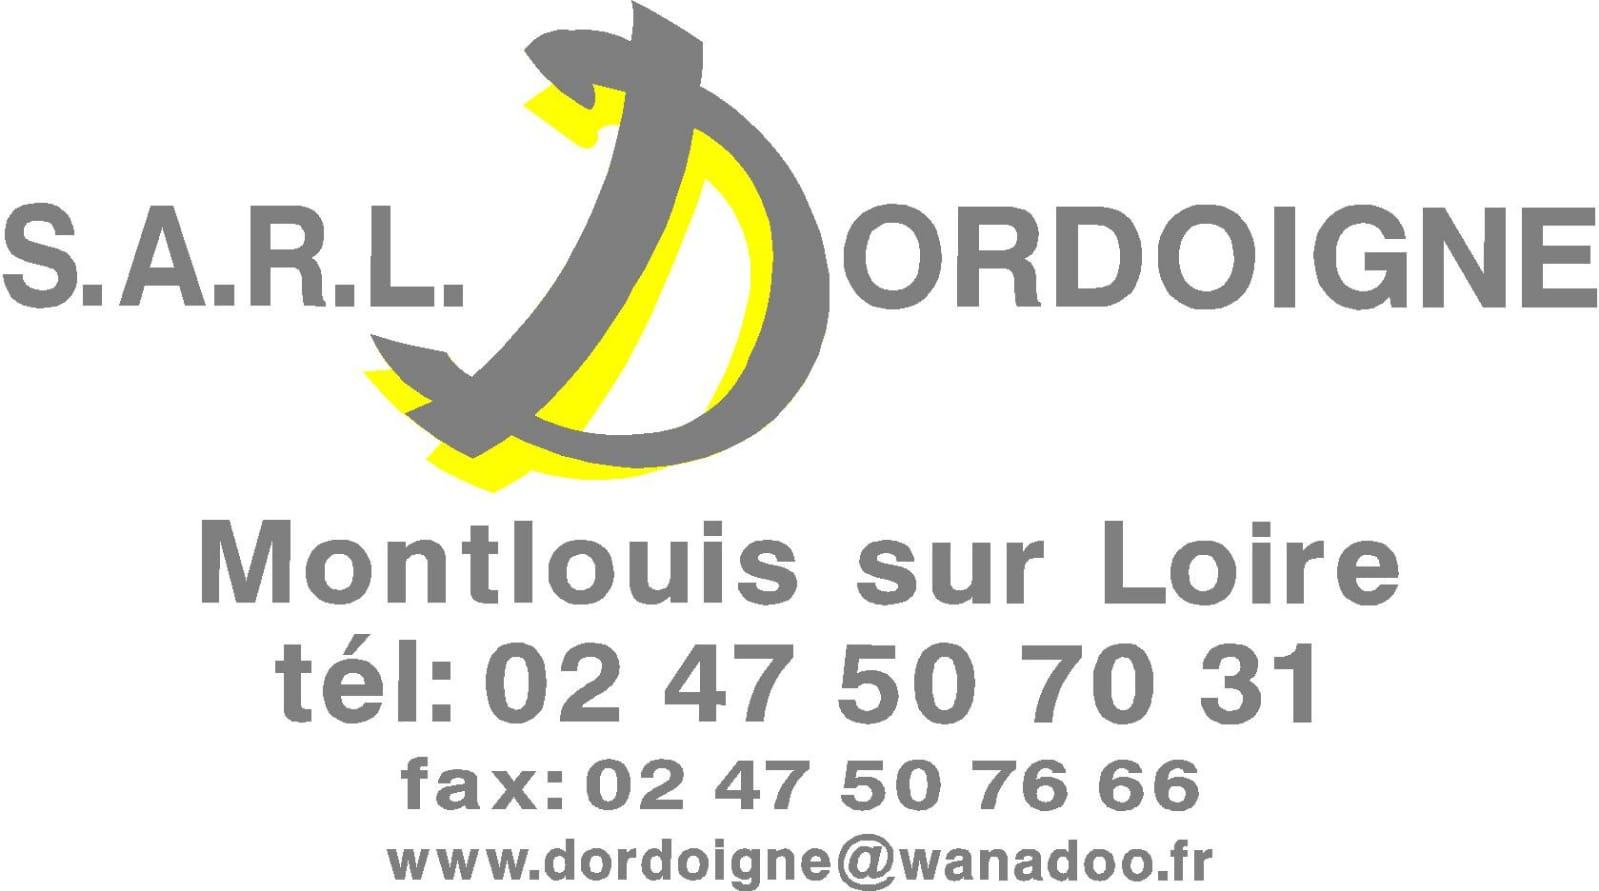 SARL Dordoigne